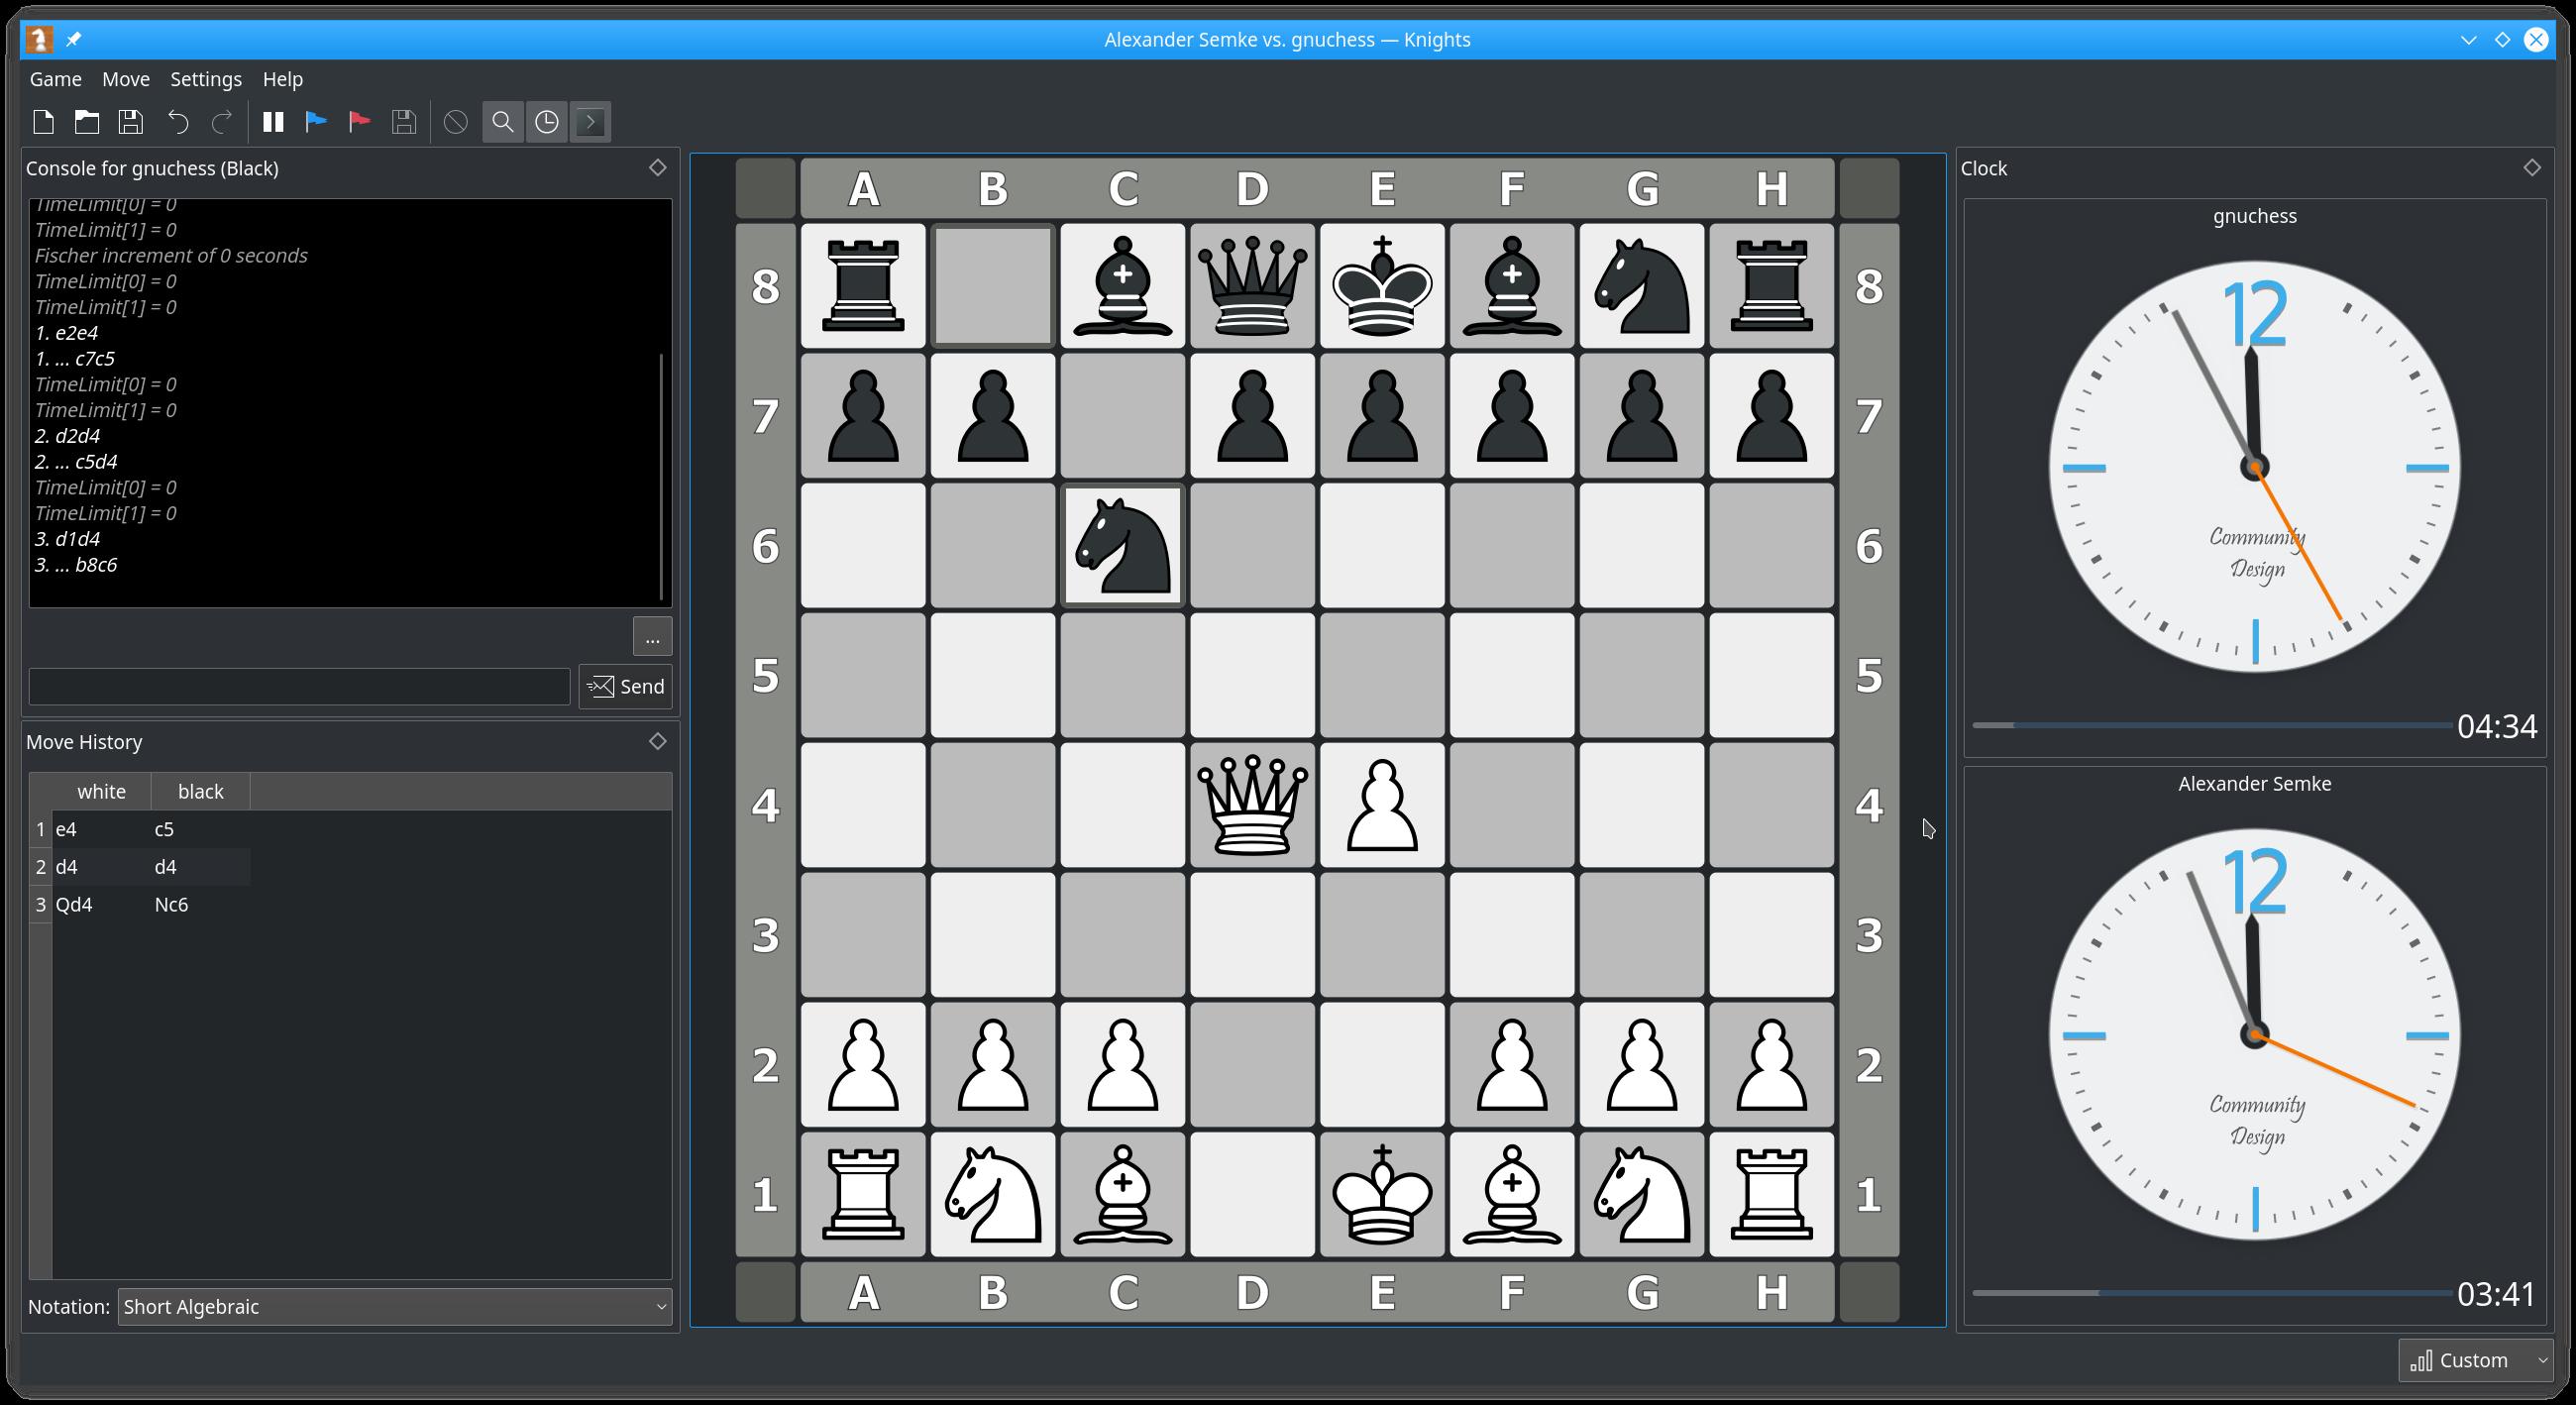 Hauptfenster - Mensch gegen Schachmodul